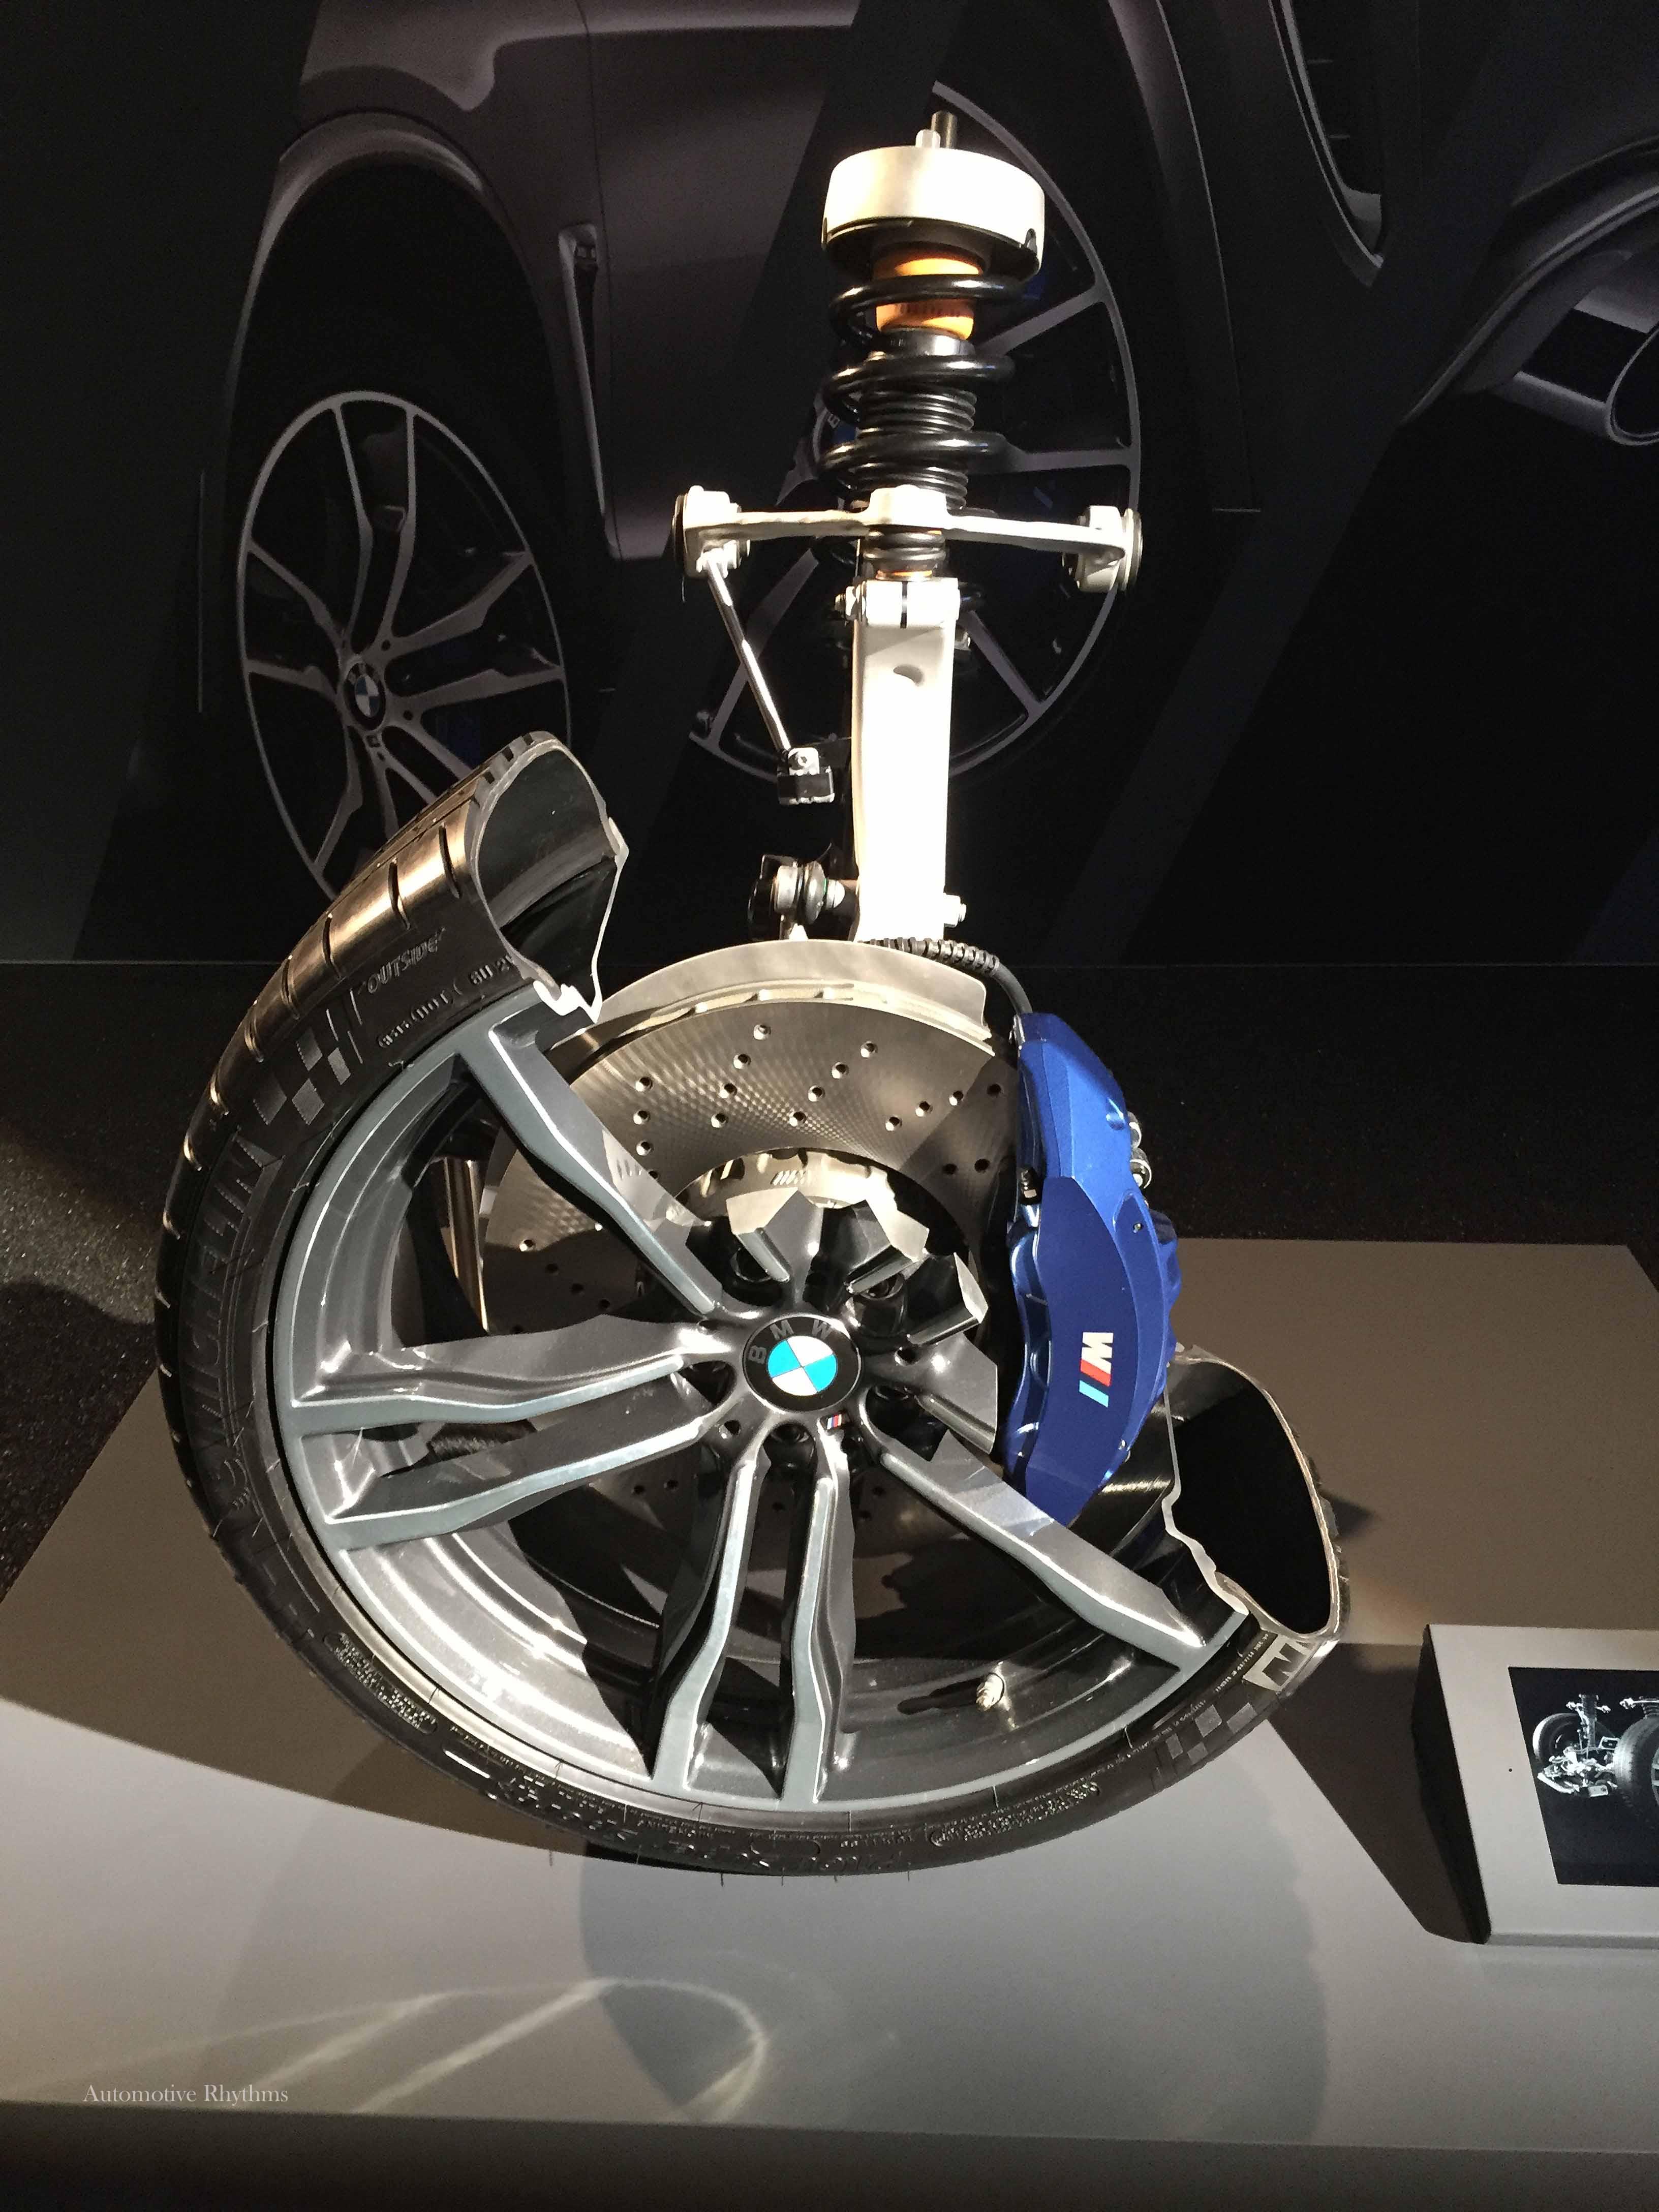 Michelin_Pilot_Super_Sport_2015_BMW_X6_M_01 copy